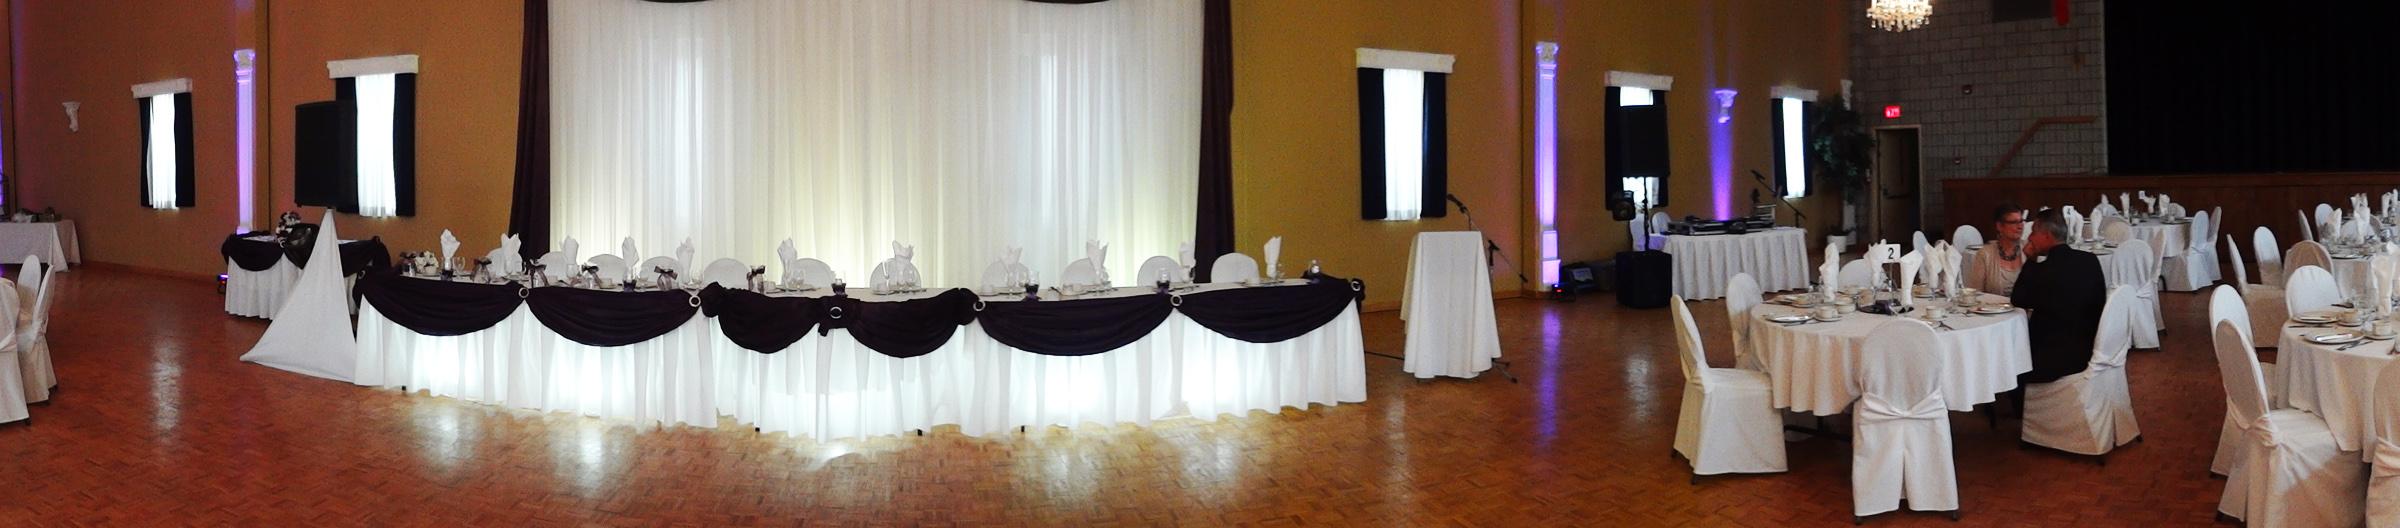 Head Table Up Lighting Wedding Del Vinyl Entertainment.jpg